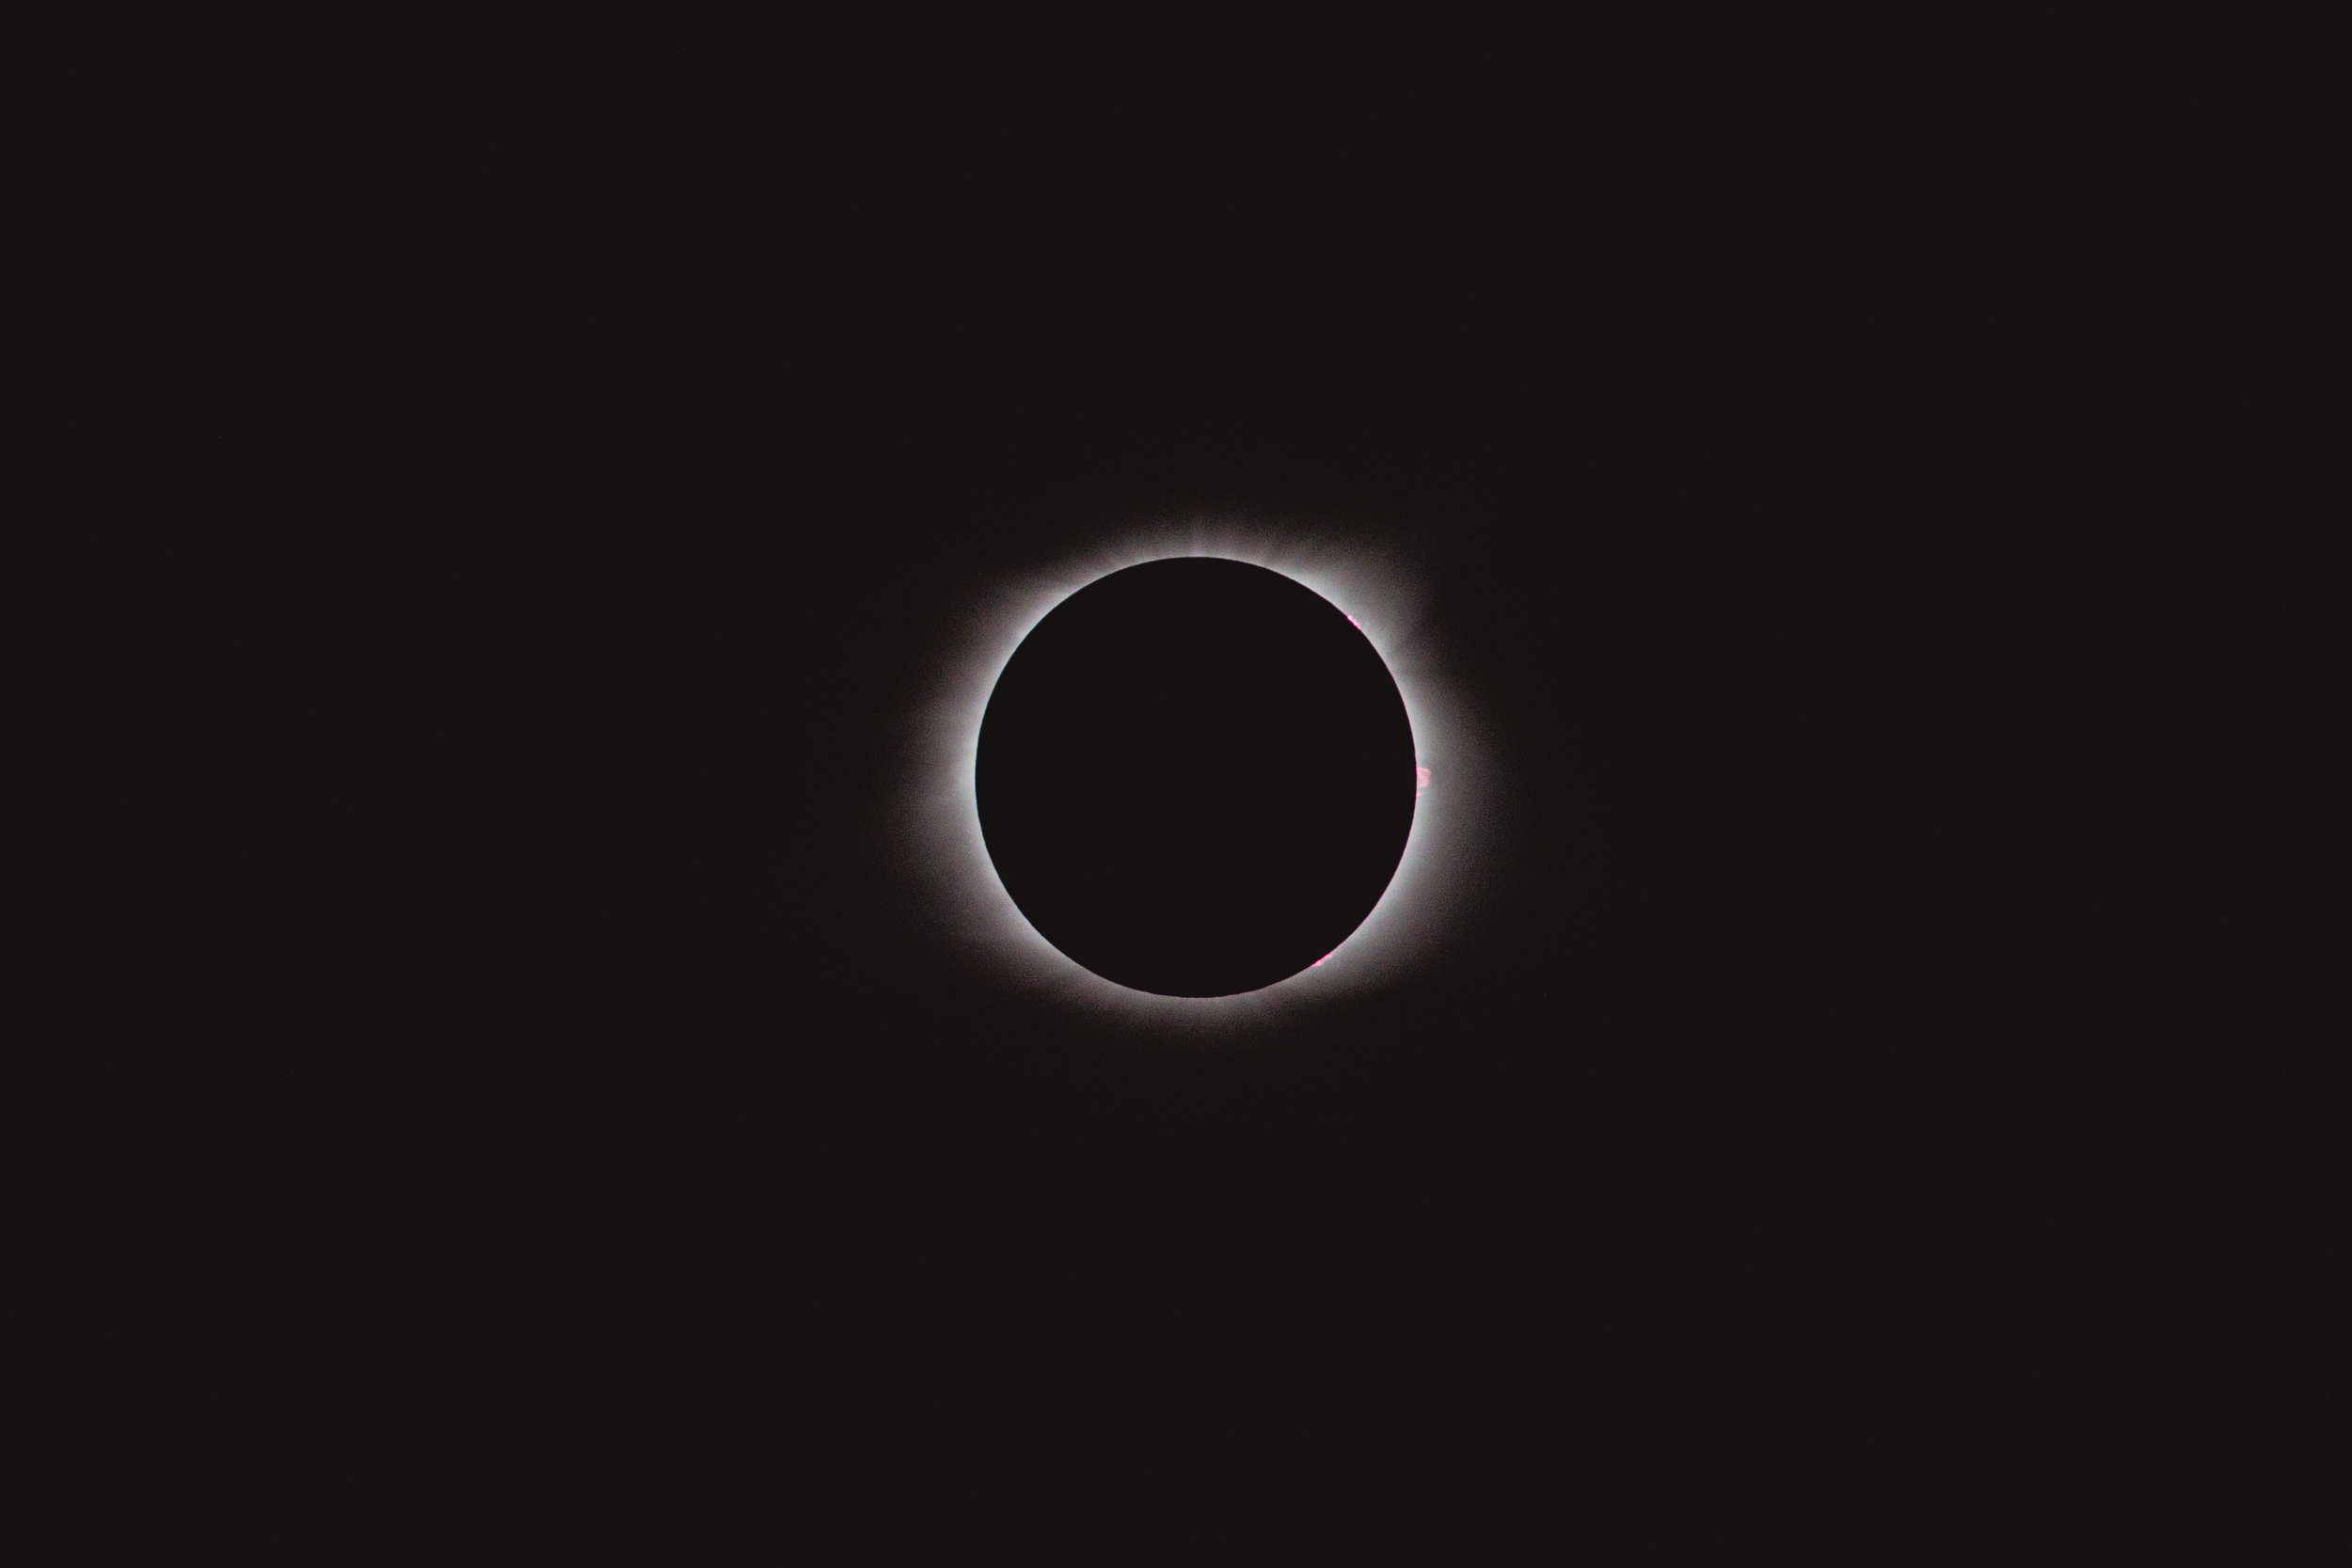 Eclipse (18 of 21).jpg